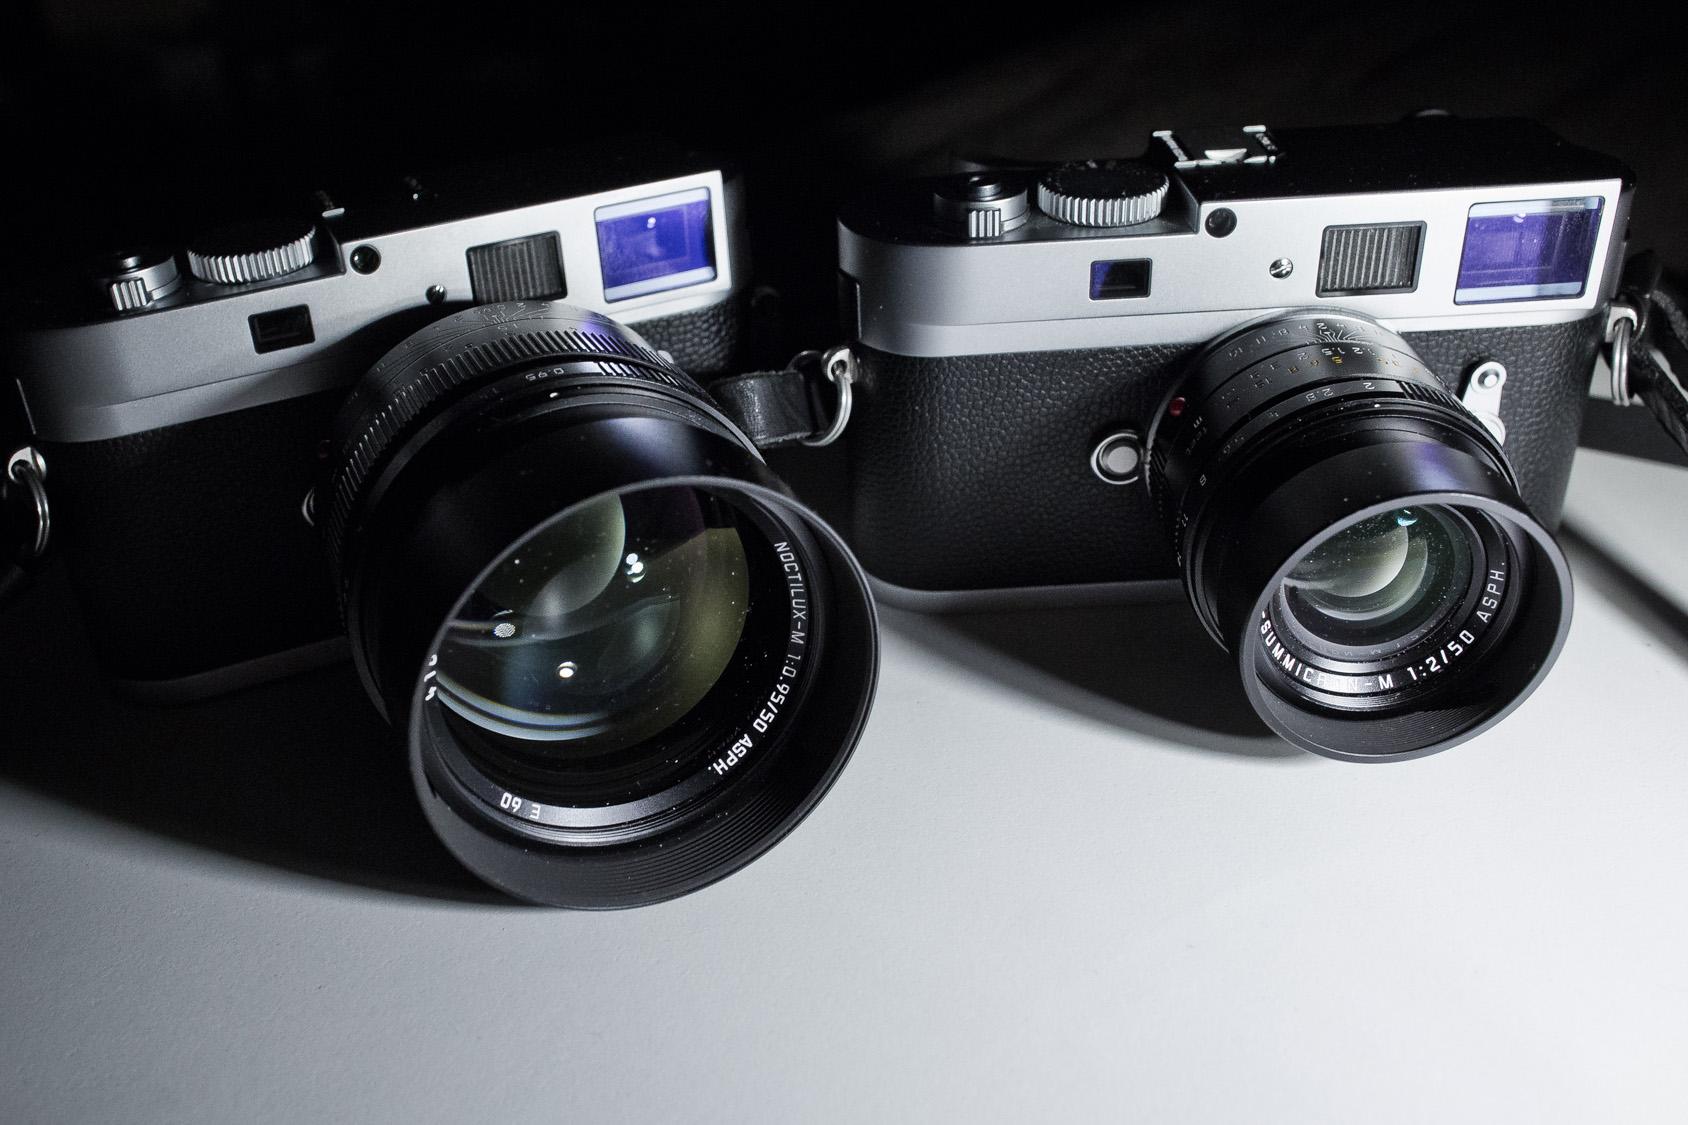 Größenvergleich Monochrom + Noctilux vs. Monochrom + 50mm APO